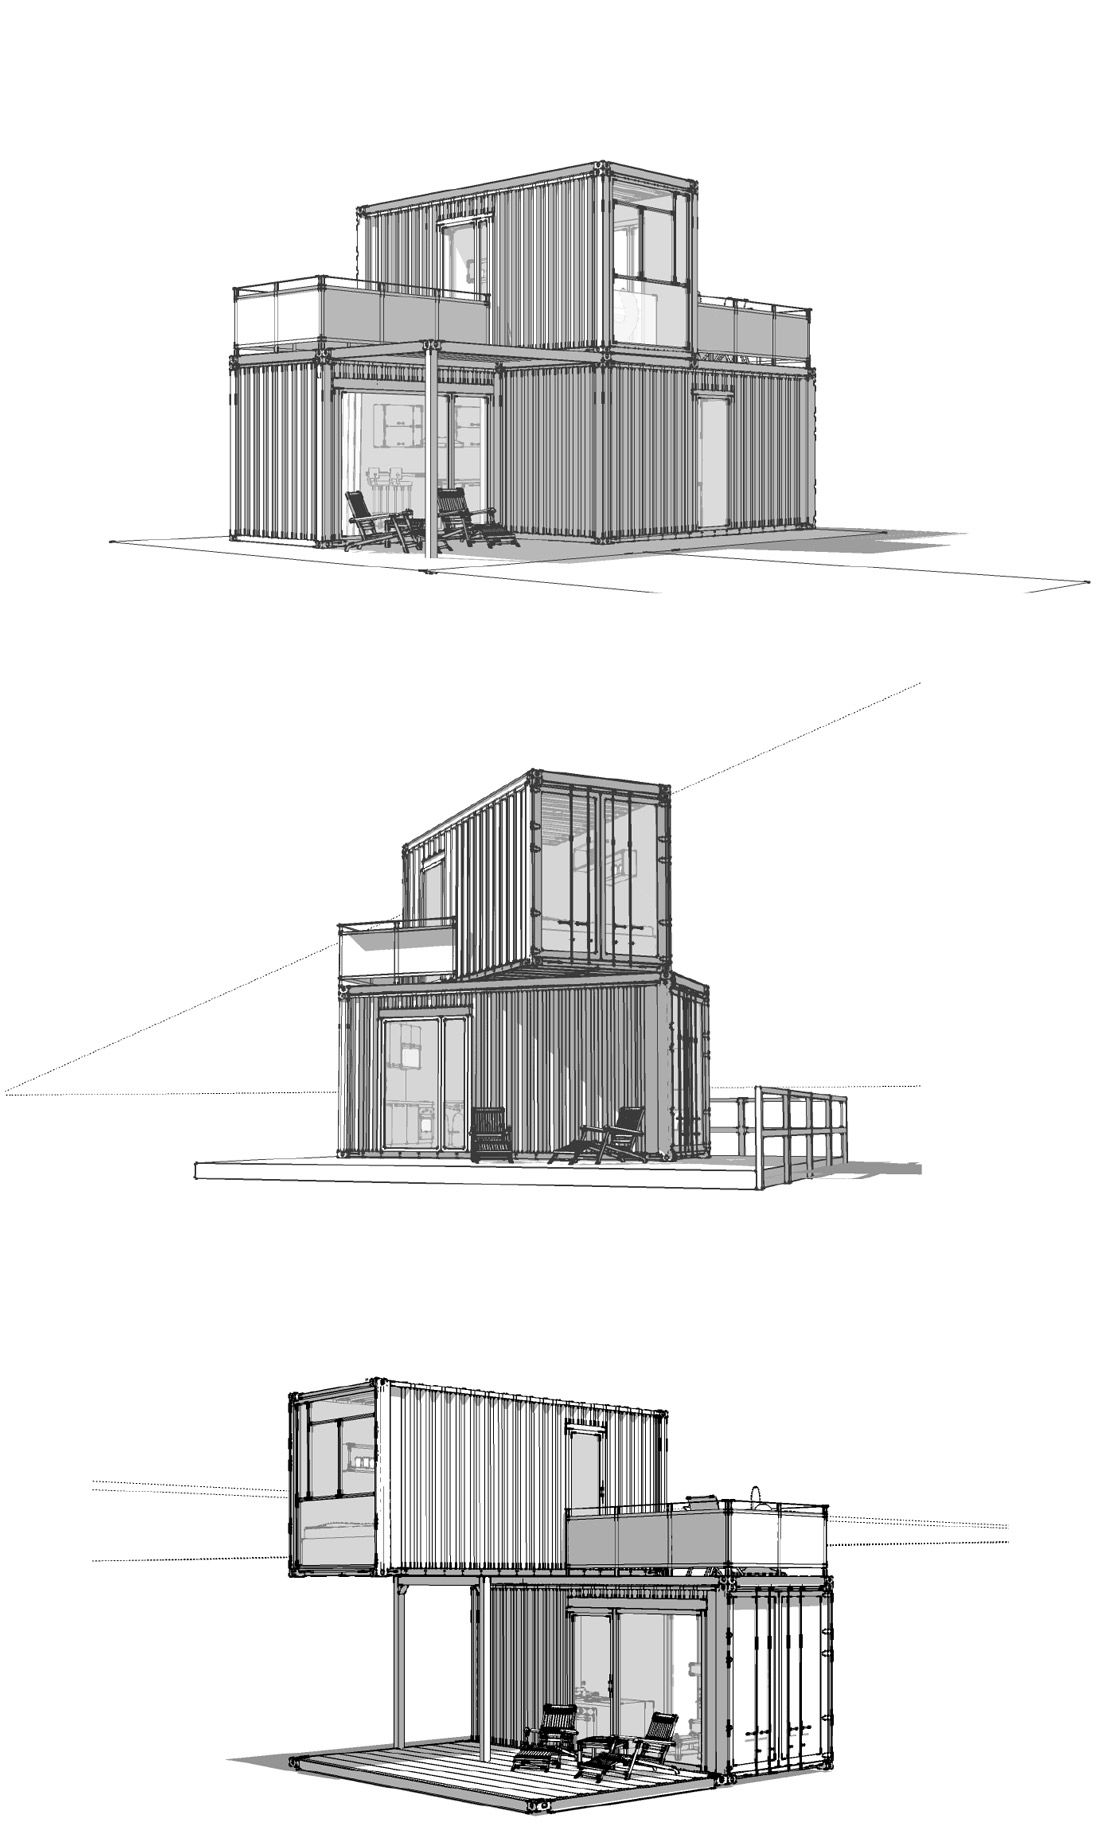 02_artdepartment_Minimalhouses_klein | Container Haus | Pinterest ...